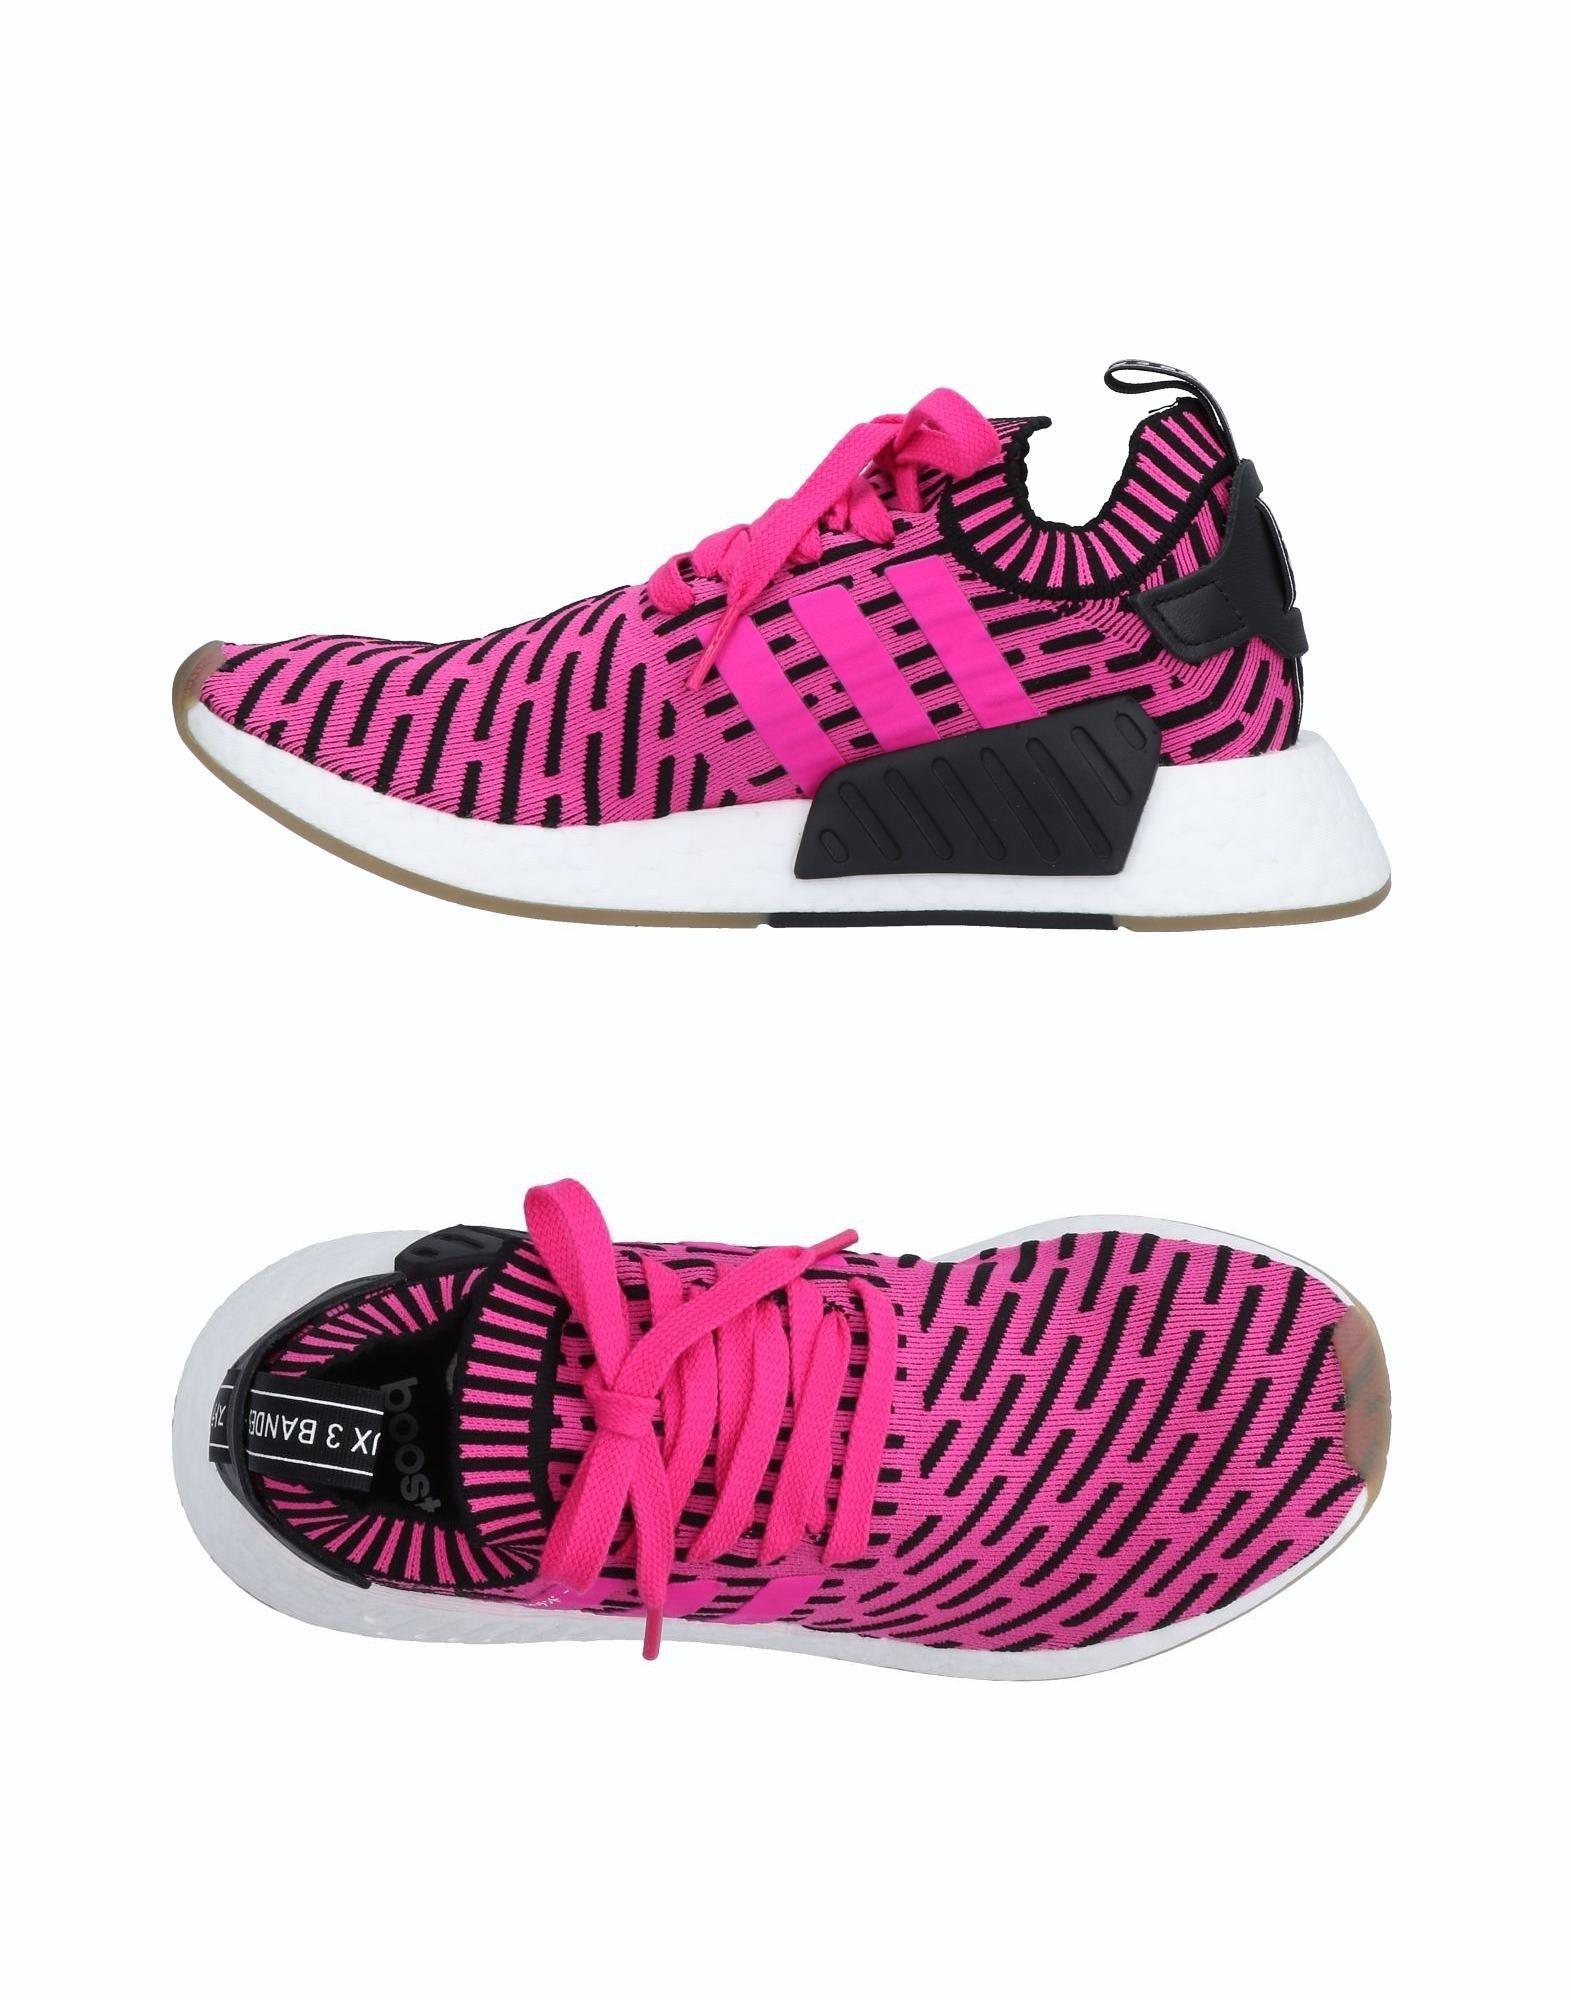 Adidas Sneakers - Men Adidas United Sneakers online on  United Adidas Kingdom - 11515867WD 4d5f9b